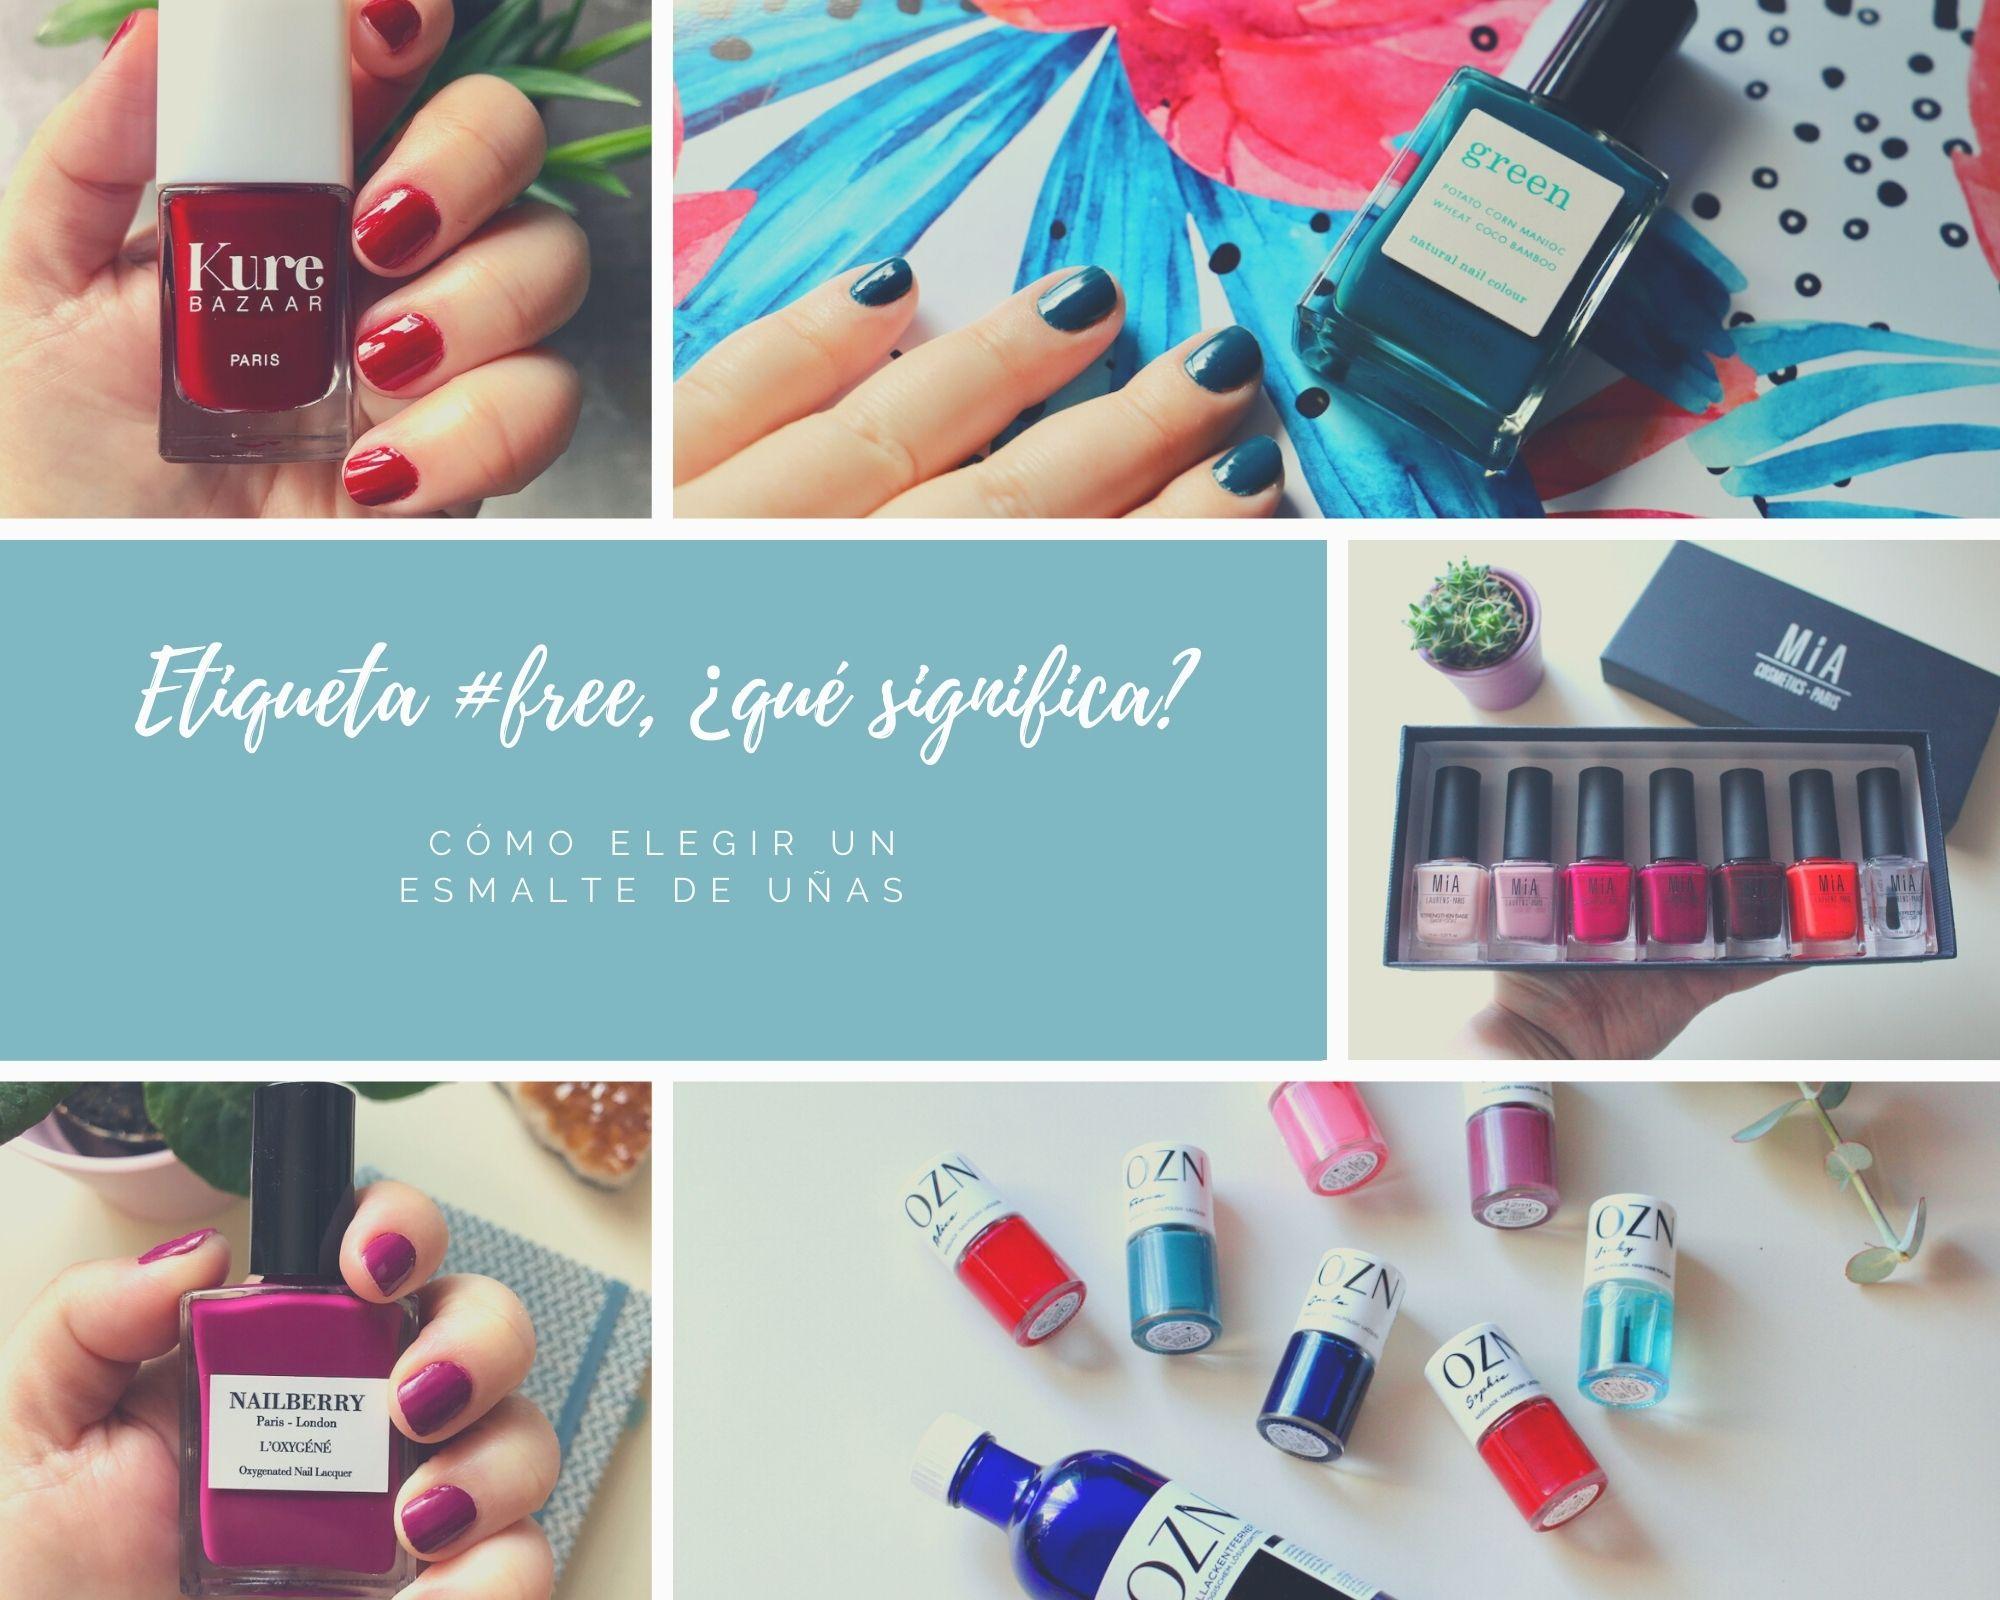 esmalte uñas, toxic free, #free,